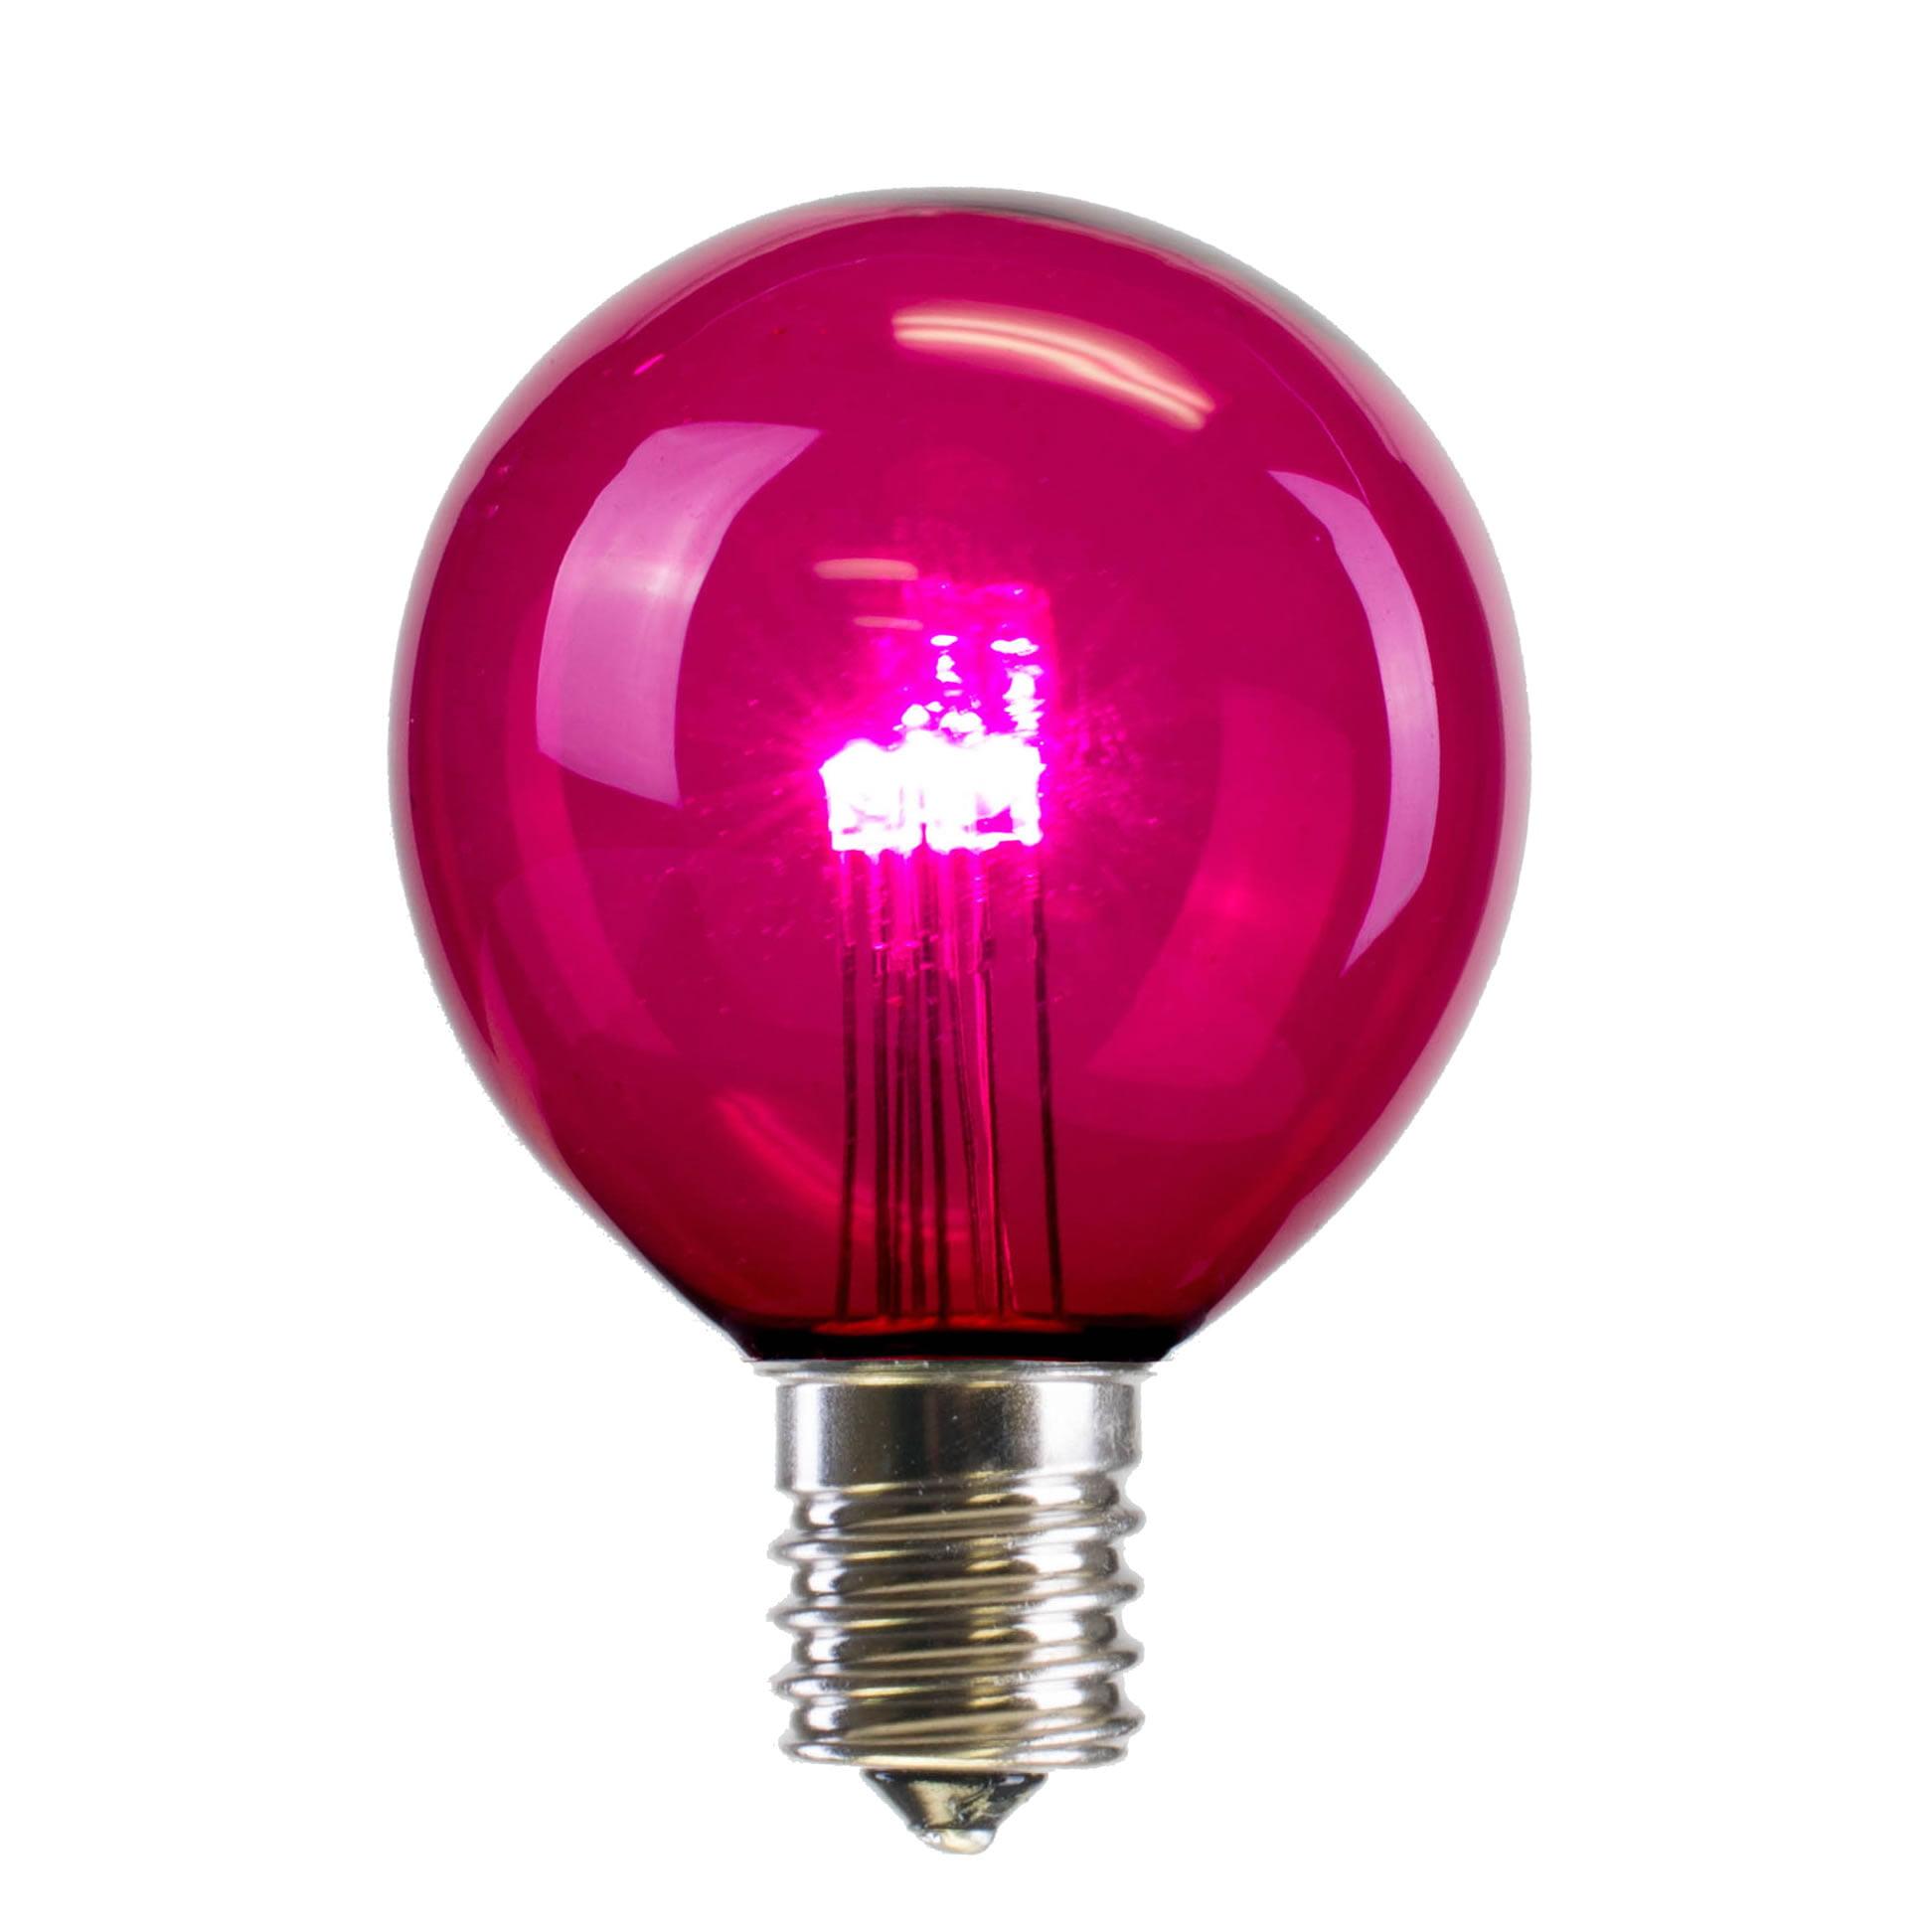 Vickerman G50 LED Pink Transparent Replacement Bulb E17 Nickel Base